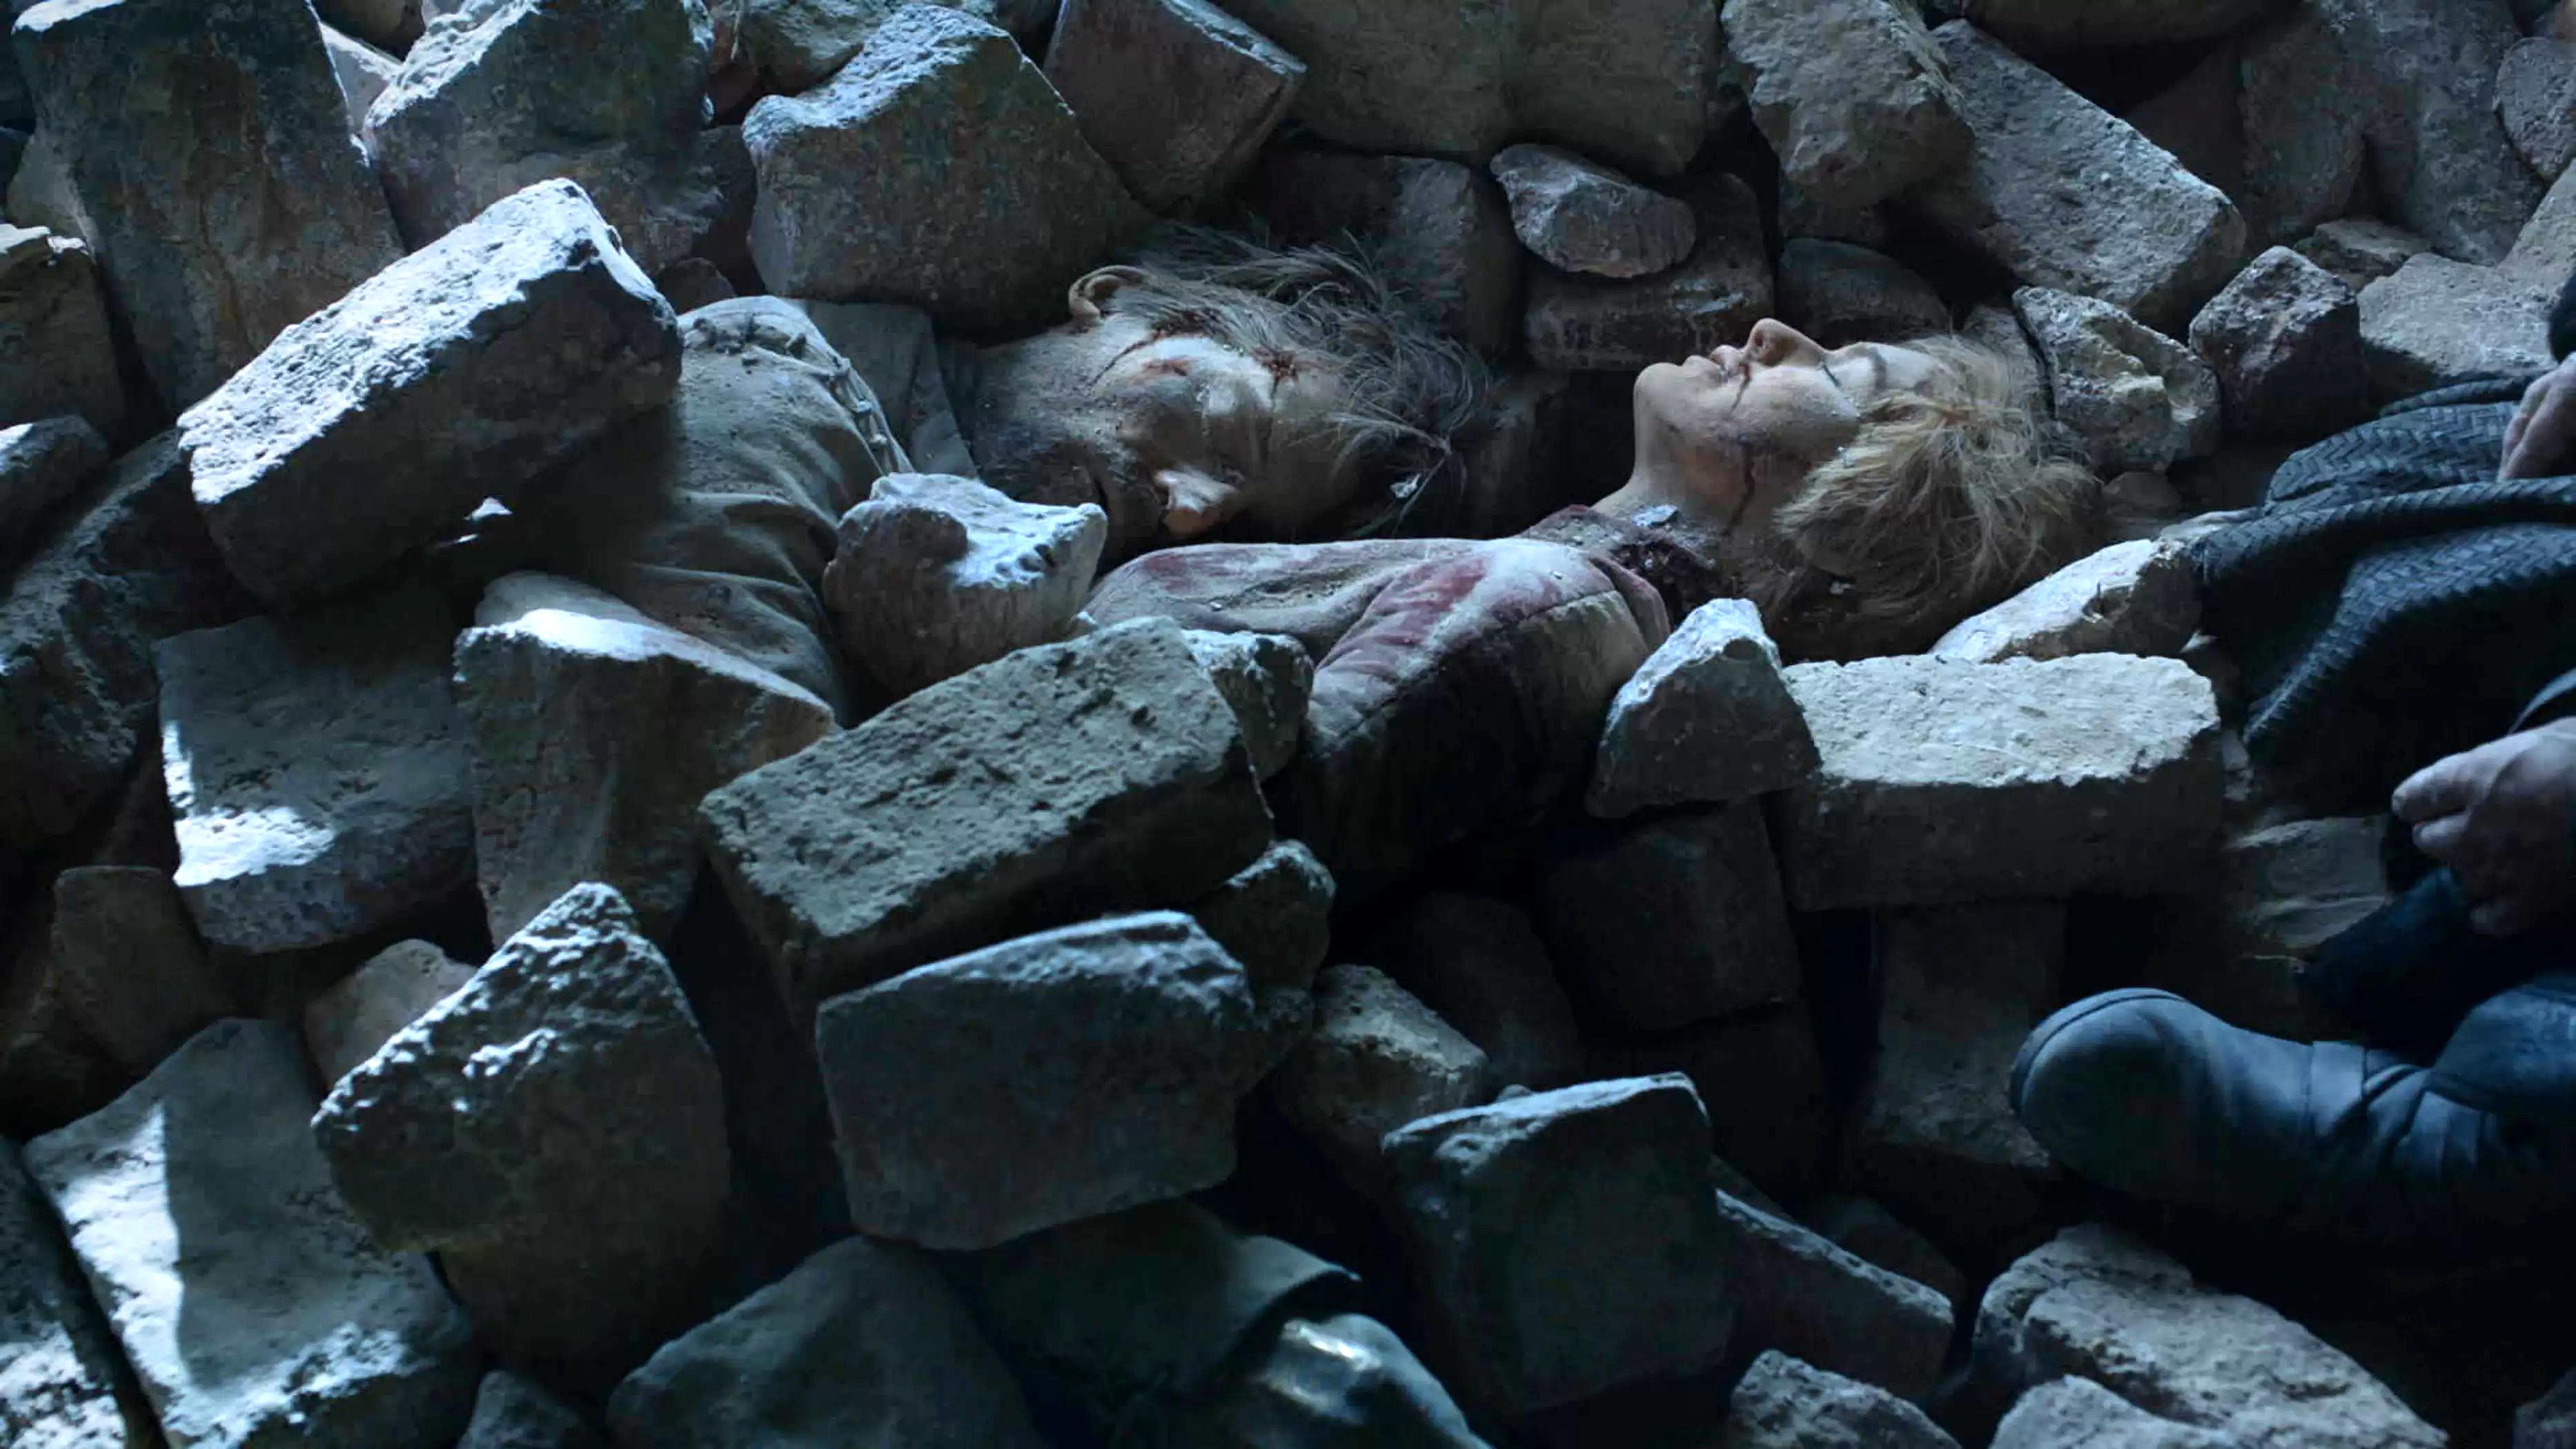 8x06 - The Iron تخت - Jaime and Cersei